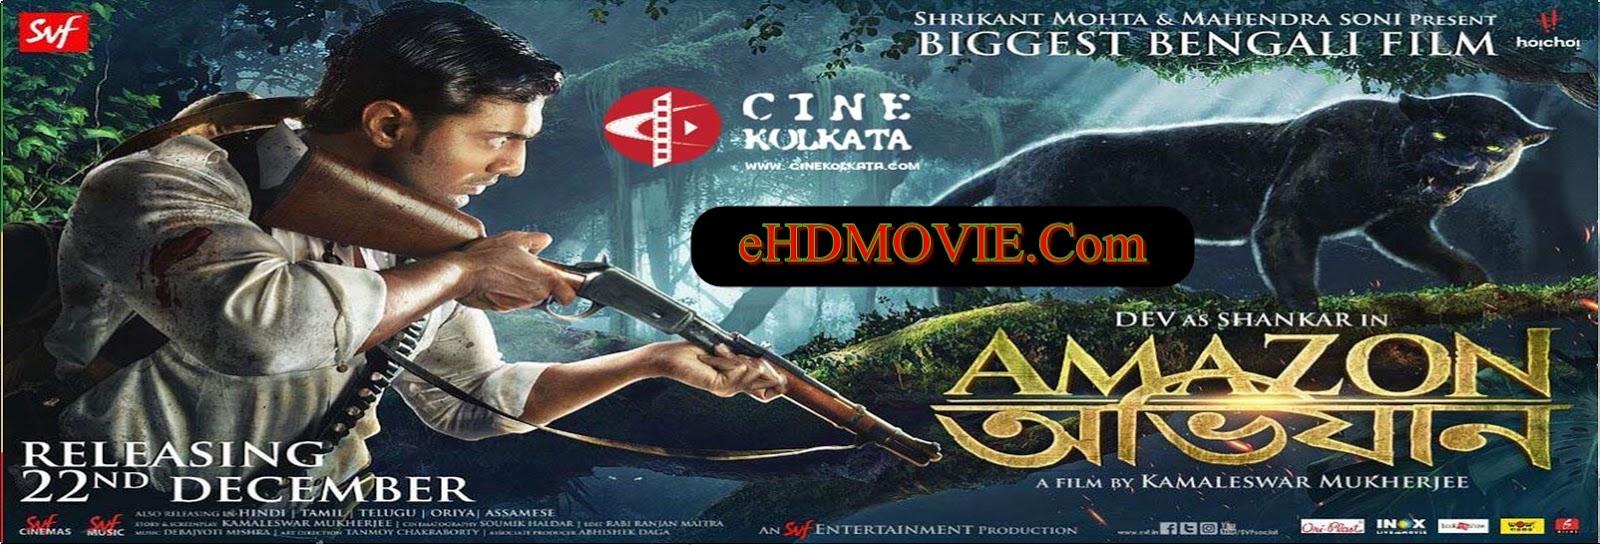 Amazon Obhijaan 2017 Bengali Full Movie Original 480p - 720p ORG WEB-DL 450MB - 1.1GB